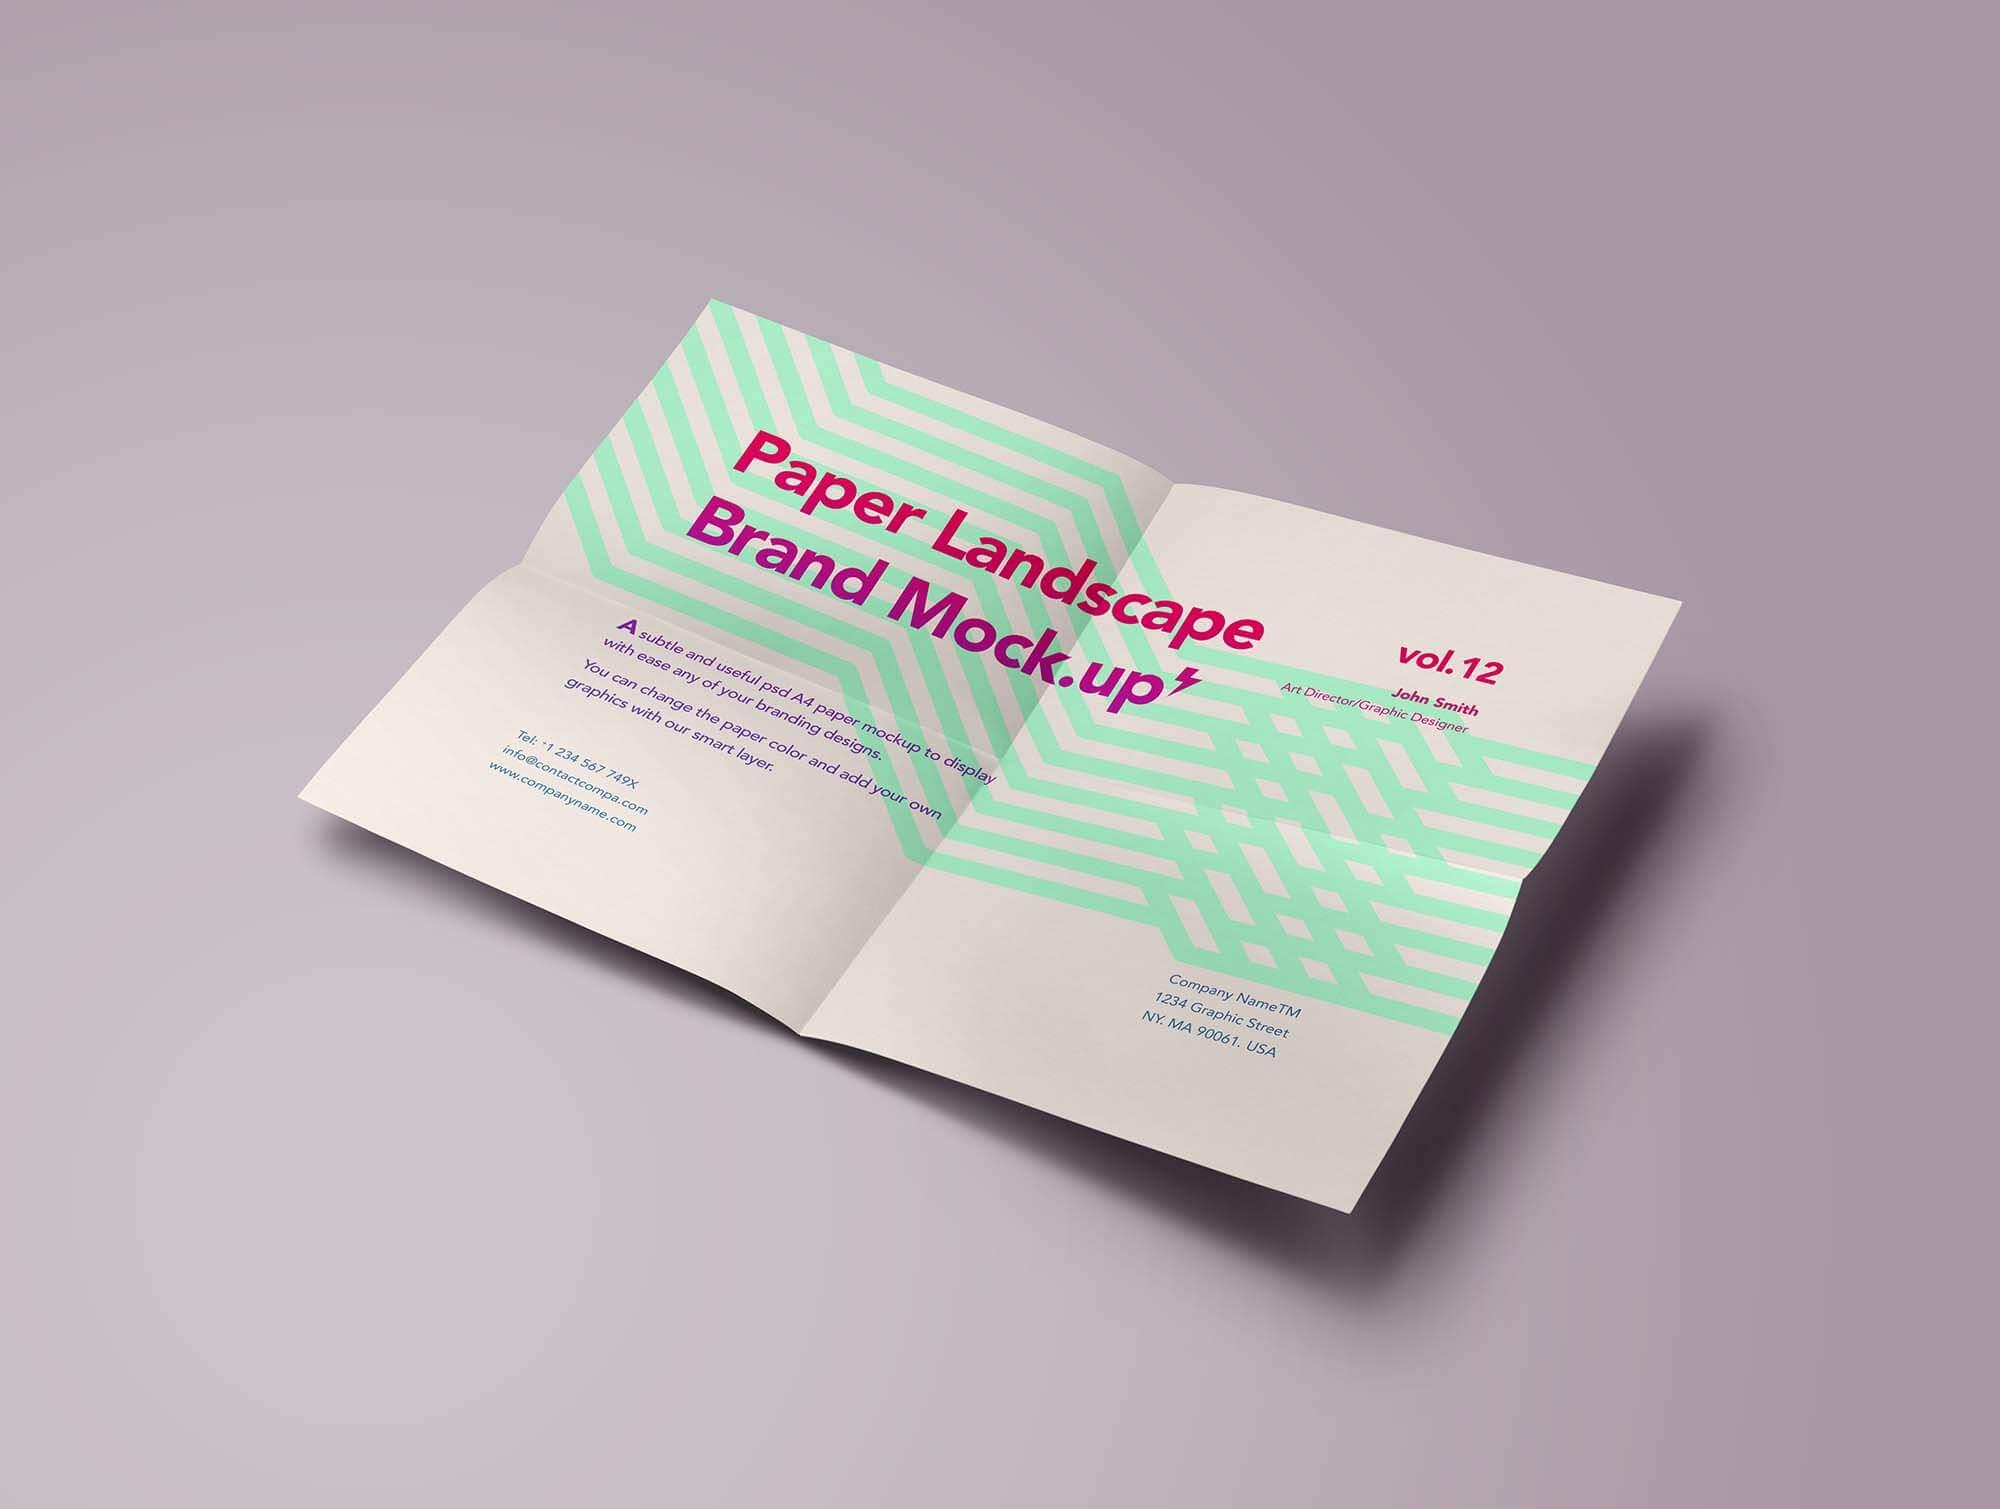 Free Landscape A4 Paper Mockup